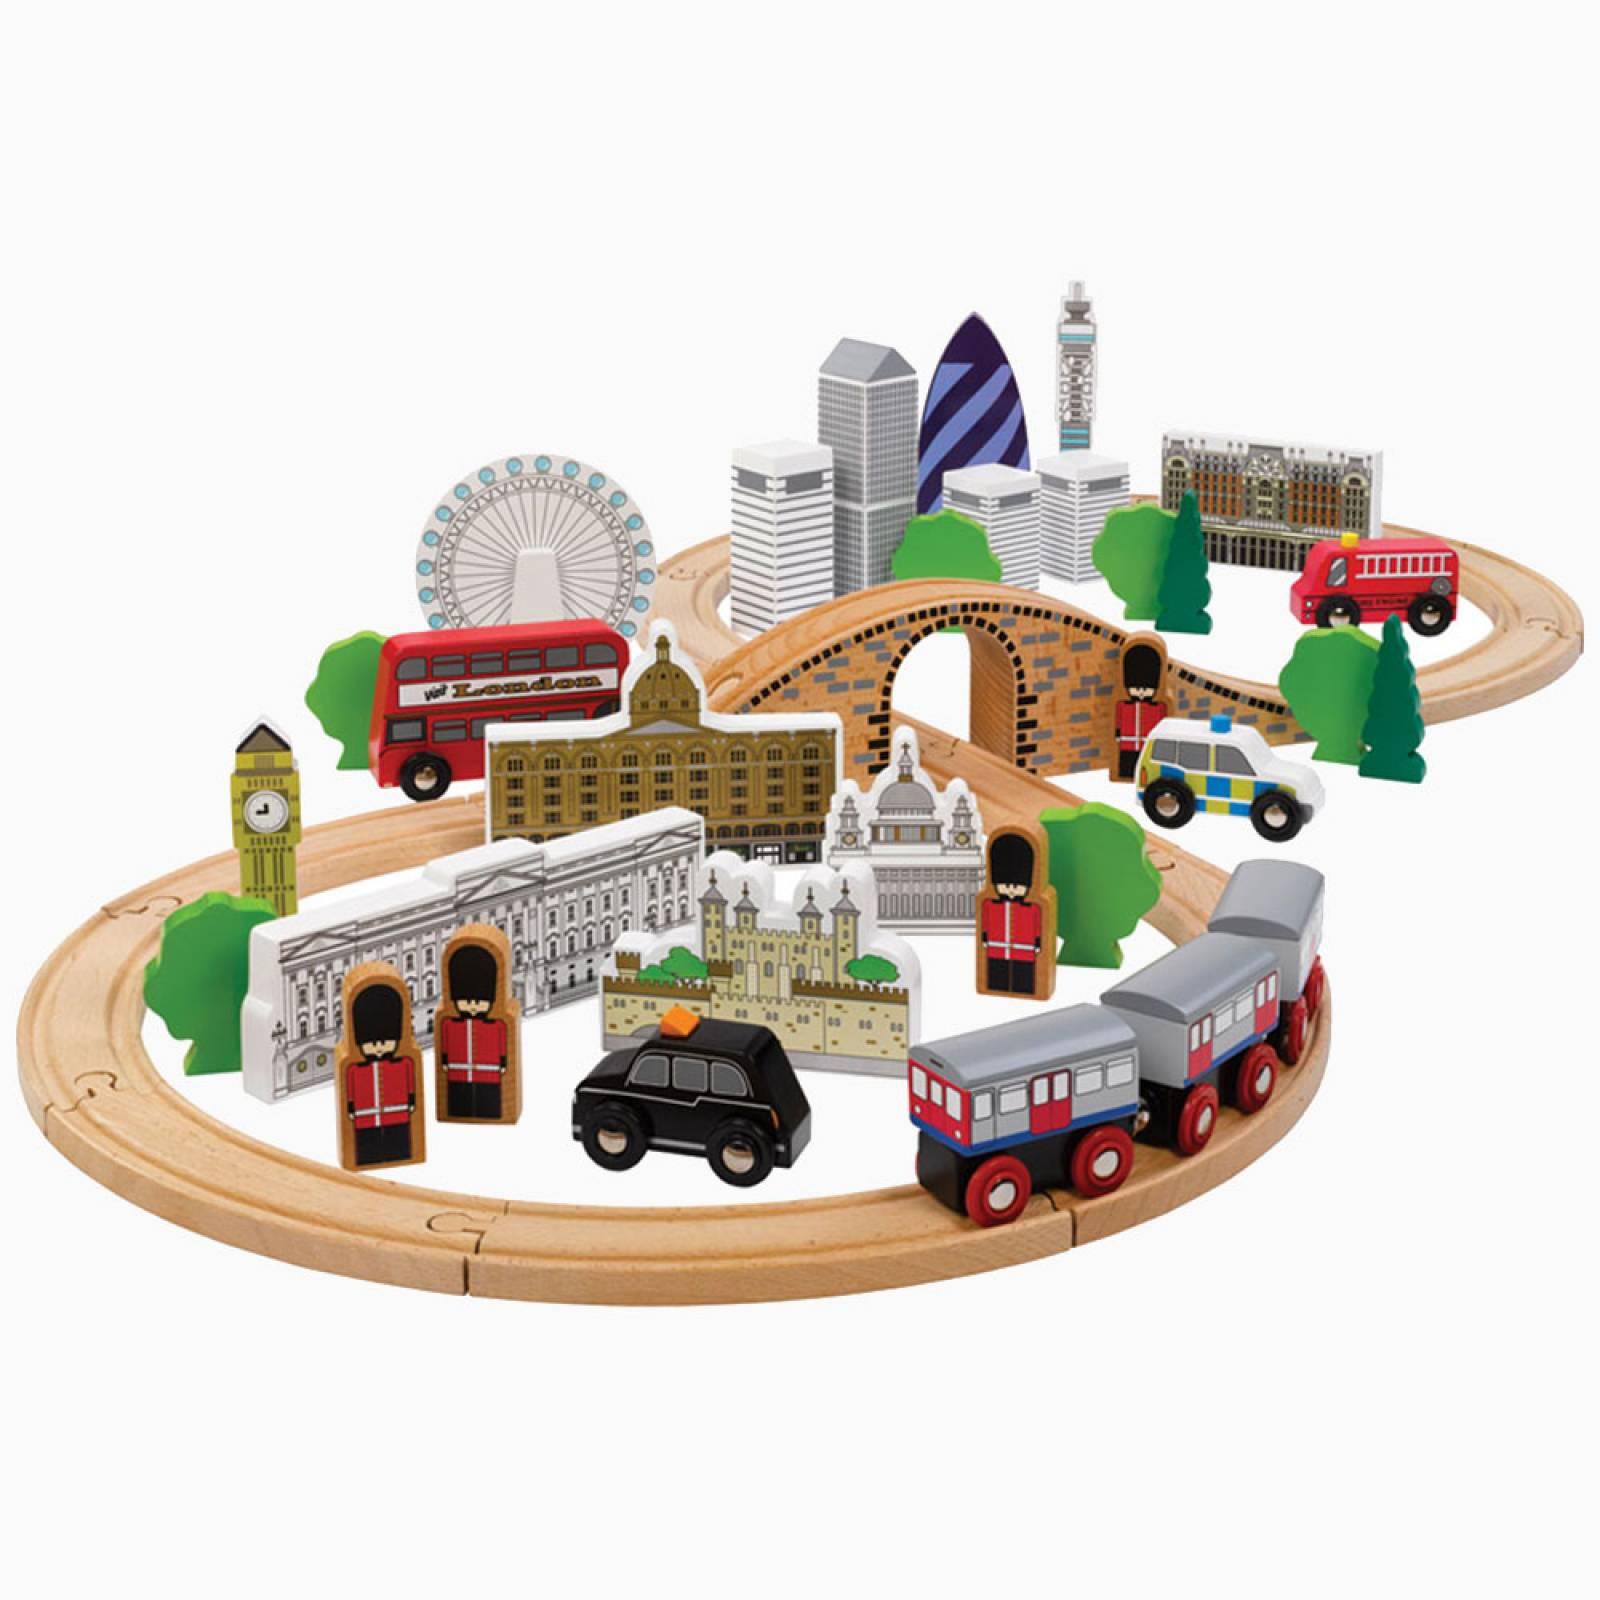 City Of London Train Set Wooden Railway 3+